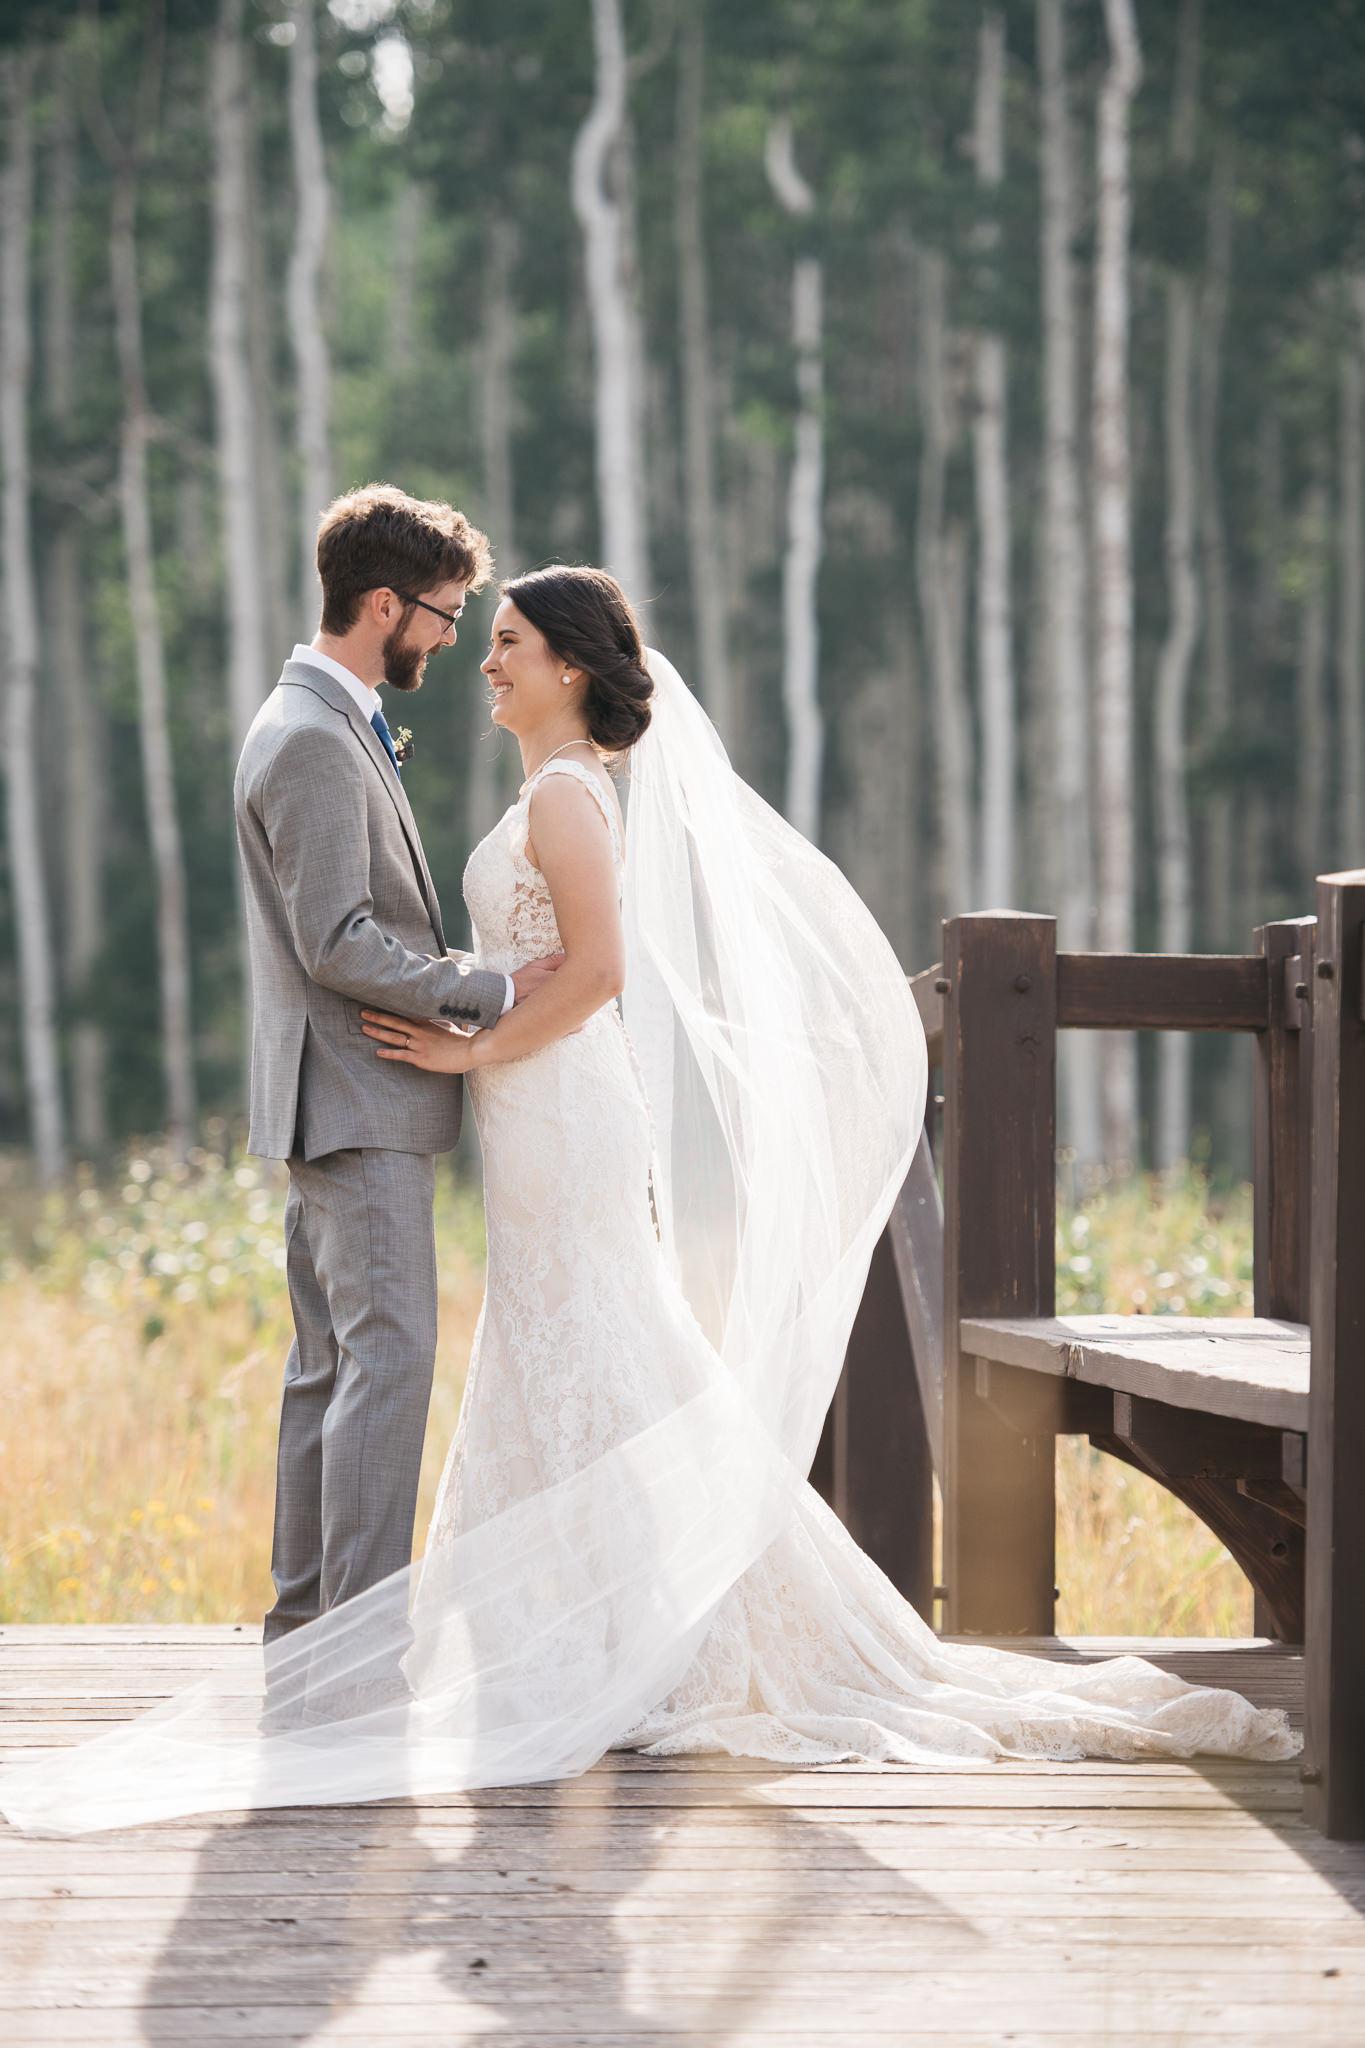 367_ONL_Kat_Nick_Wedding_Trevor_Hooper_Photo.jpg